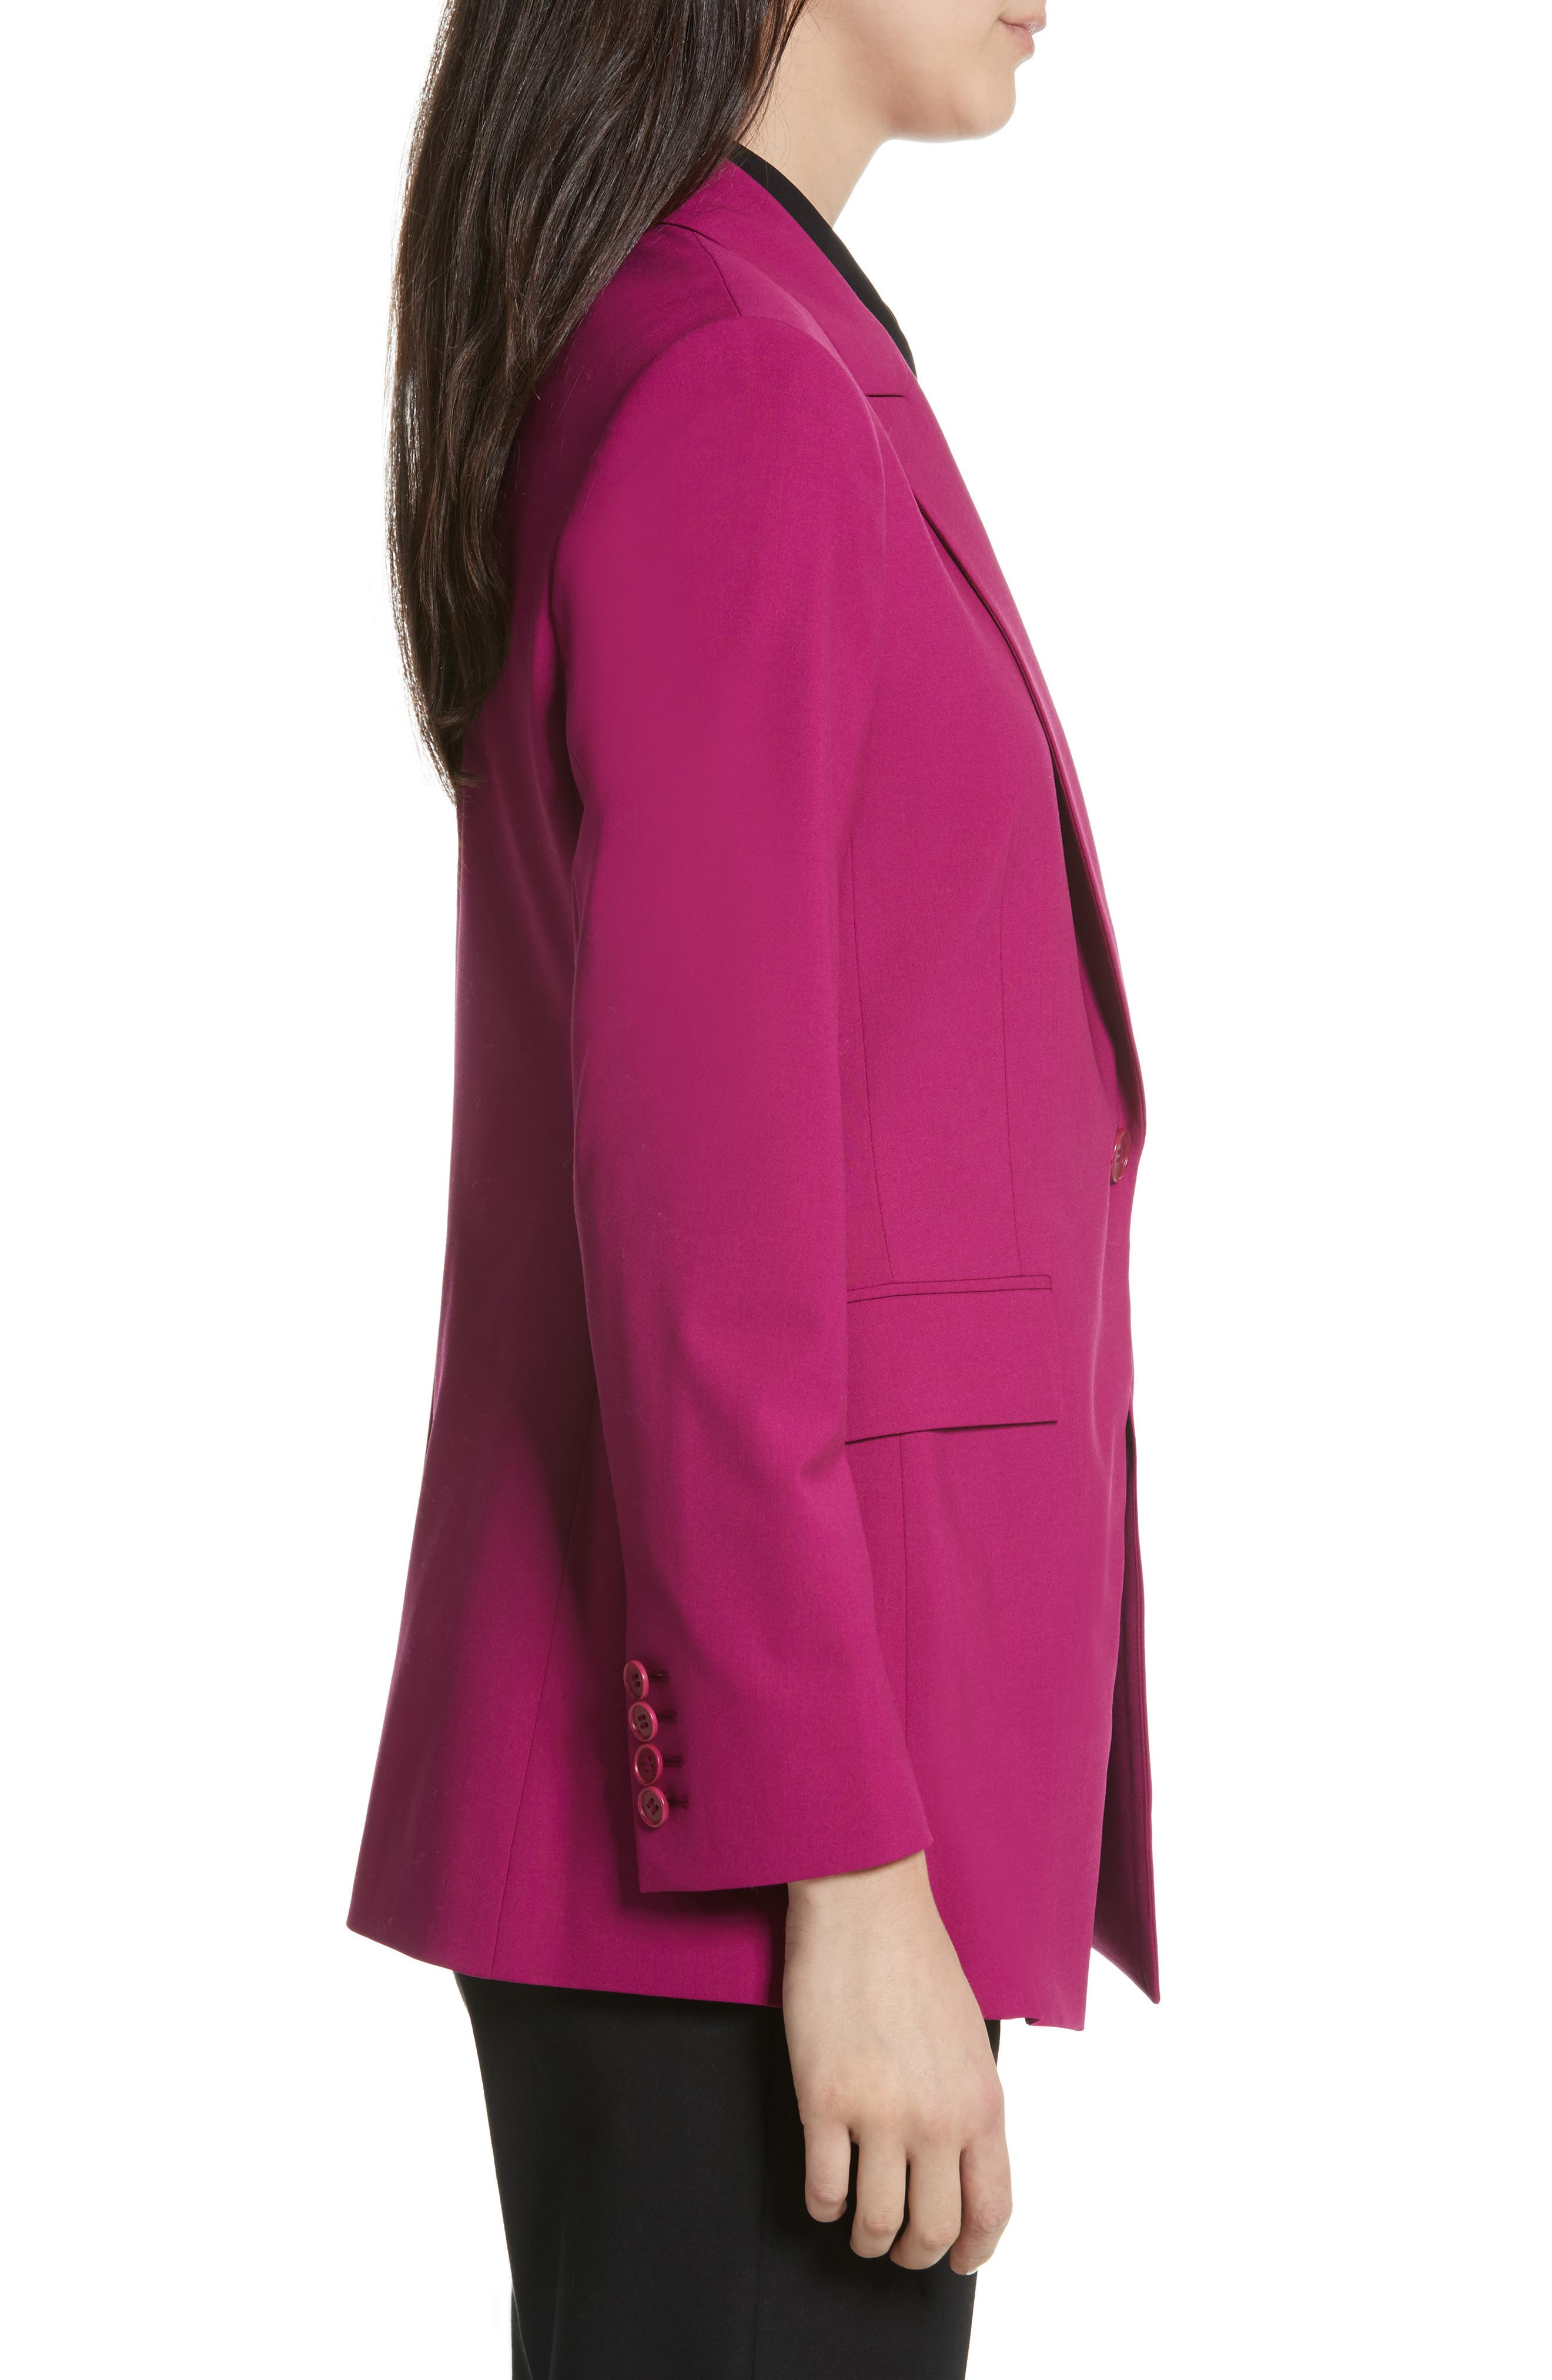 Etienette B Good Wool Suit Jacket,                             Alternate thumbnail 4, color,                             Electric Pink